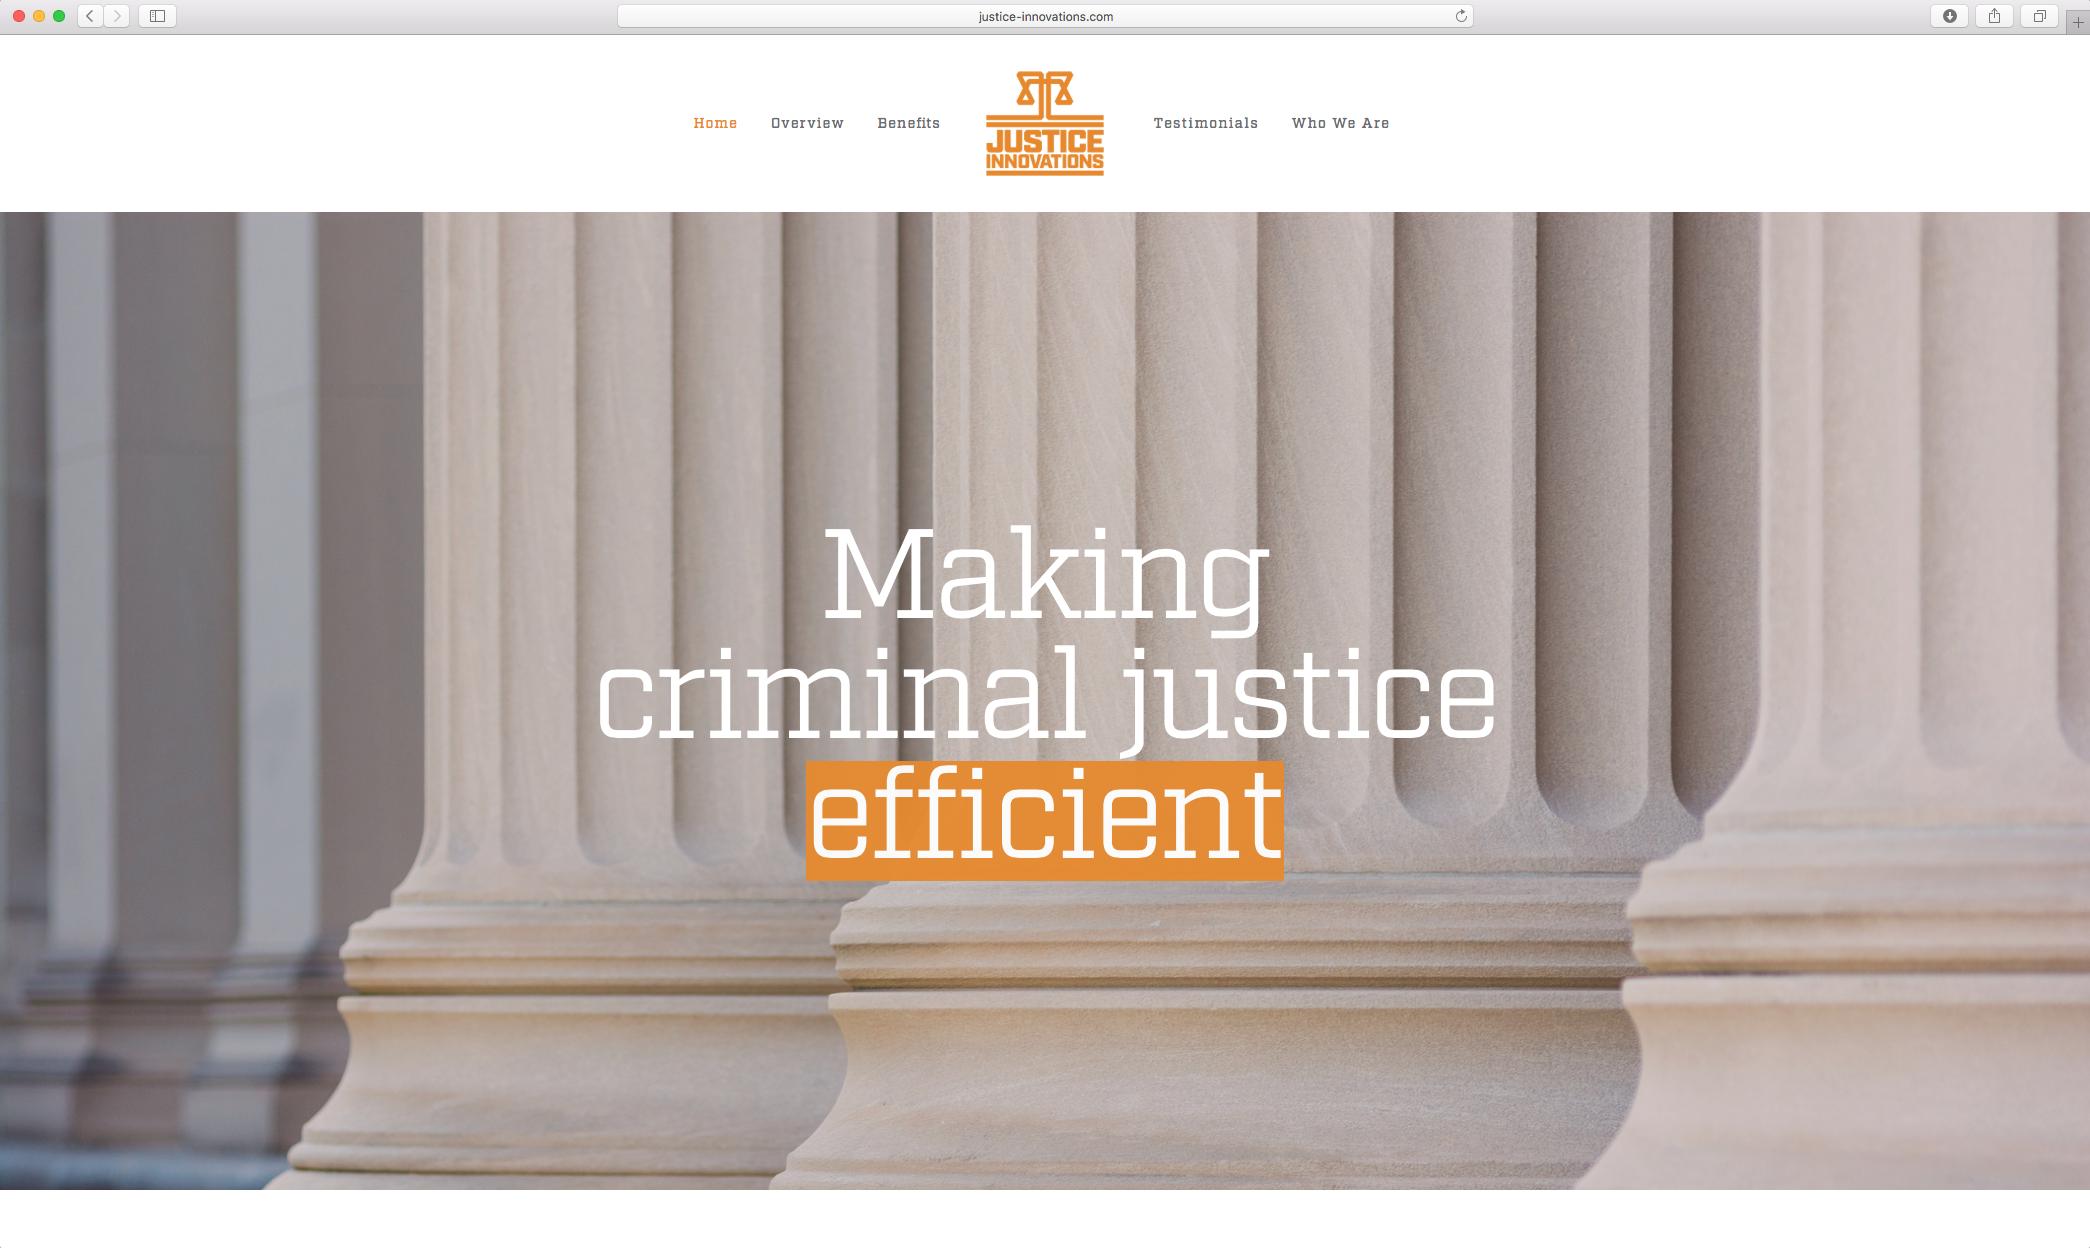 Graphic-Designer-Houston-Bradie-Bradshaw-Justice-Innovations-1.png